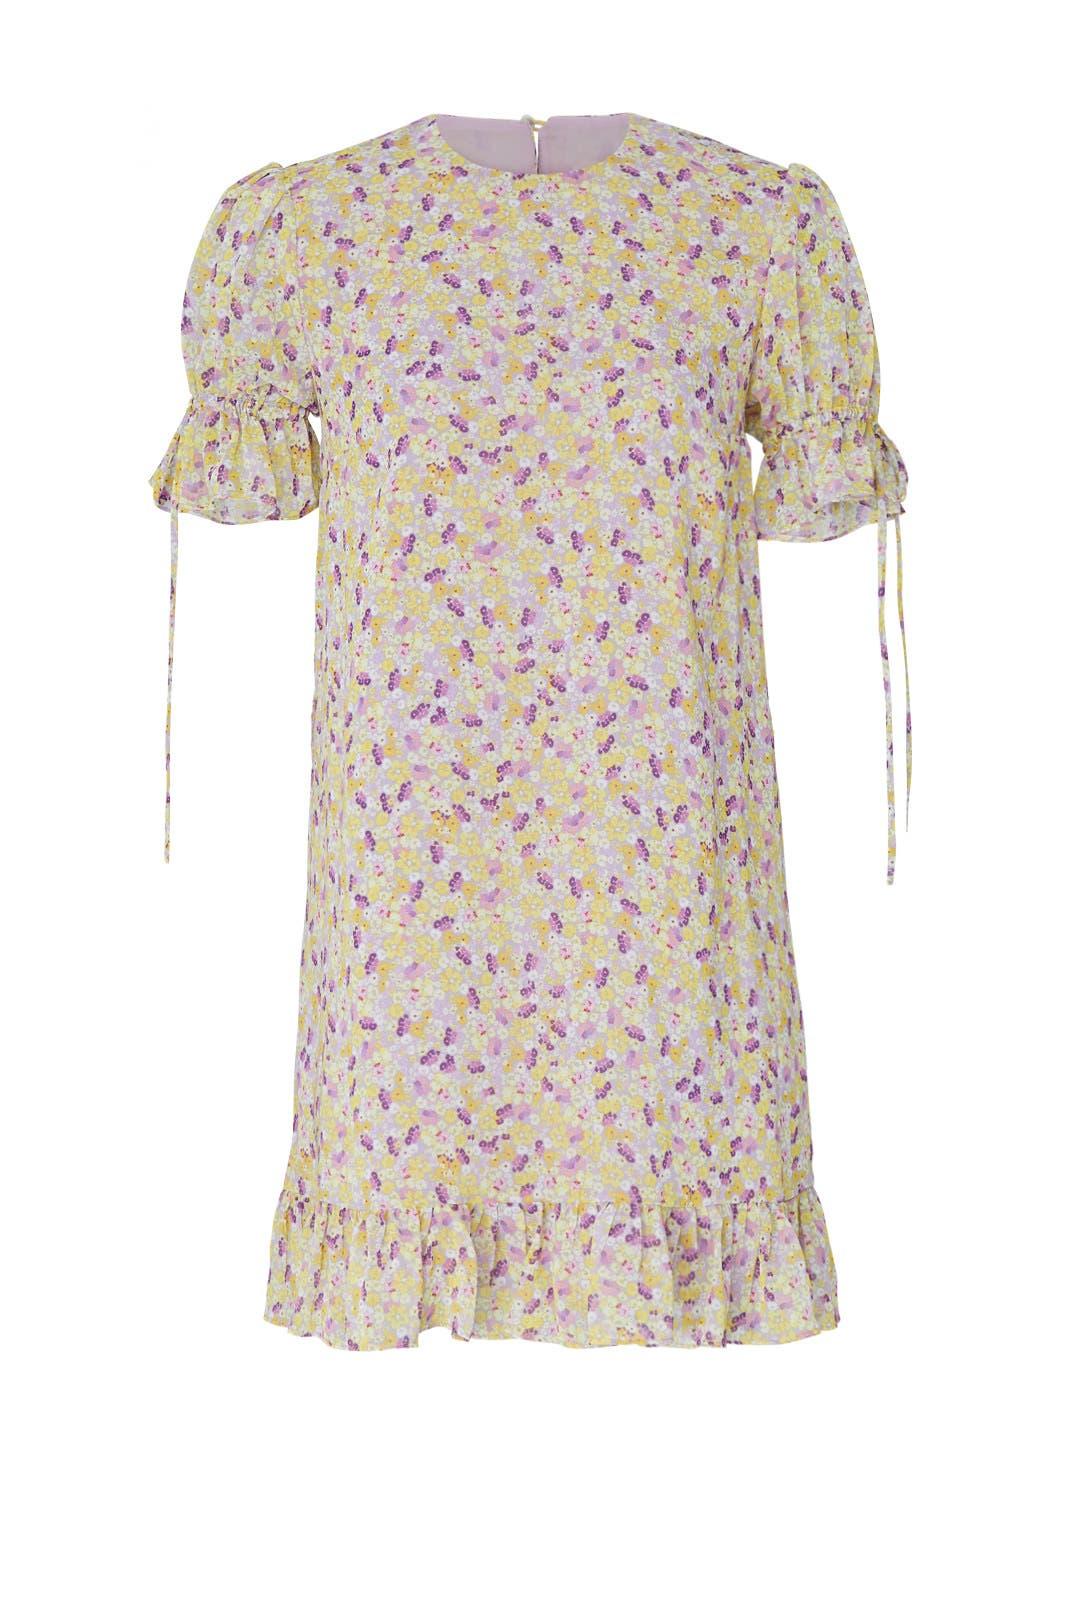 The East Order Arlo Mini Dress